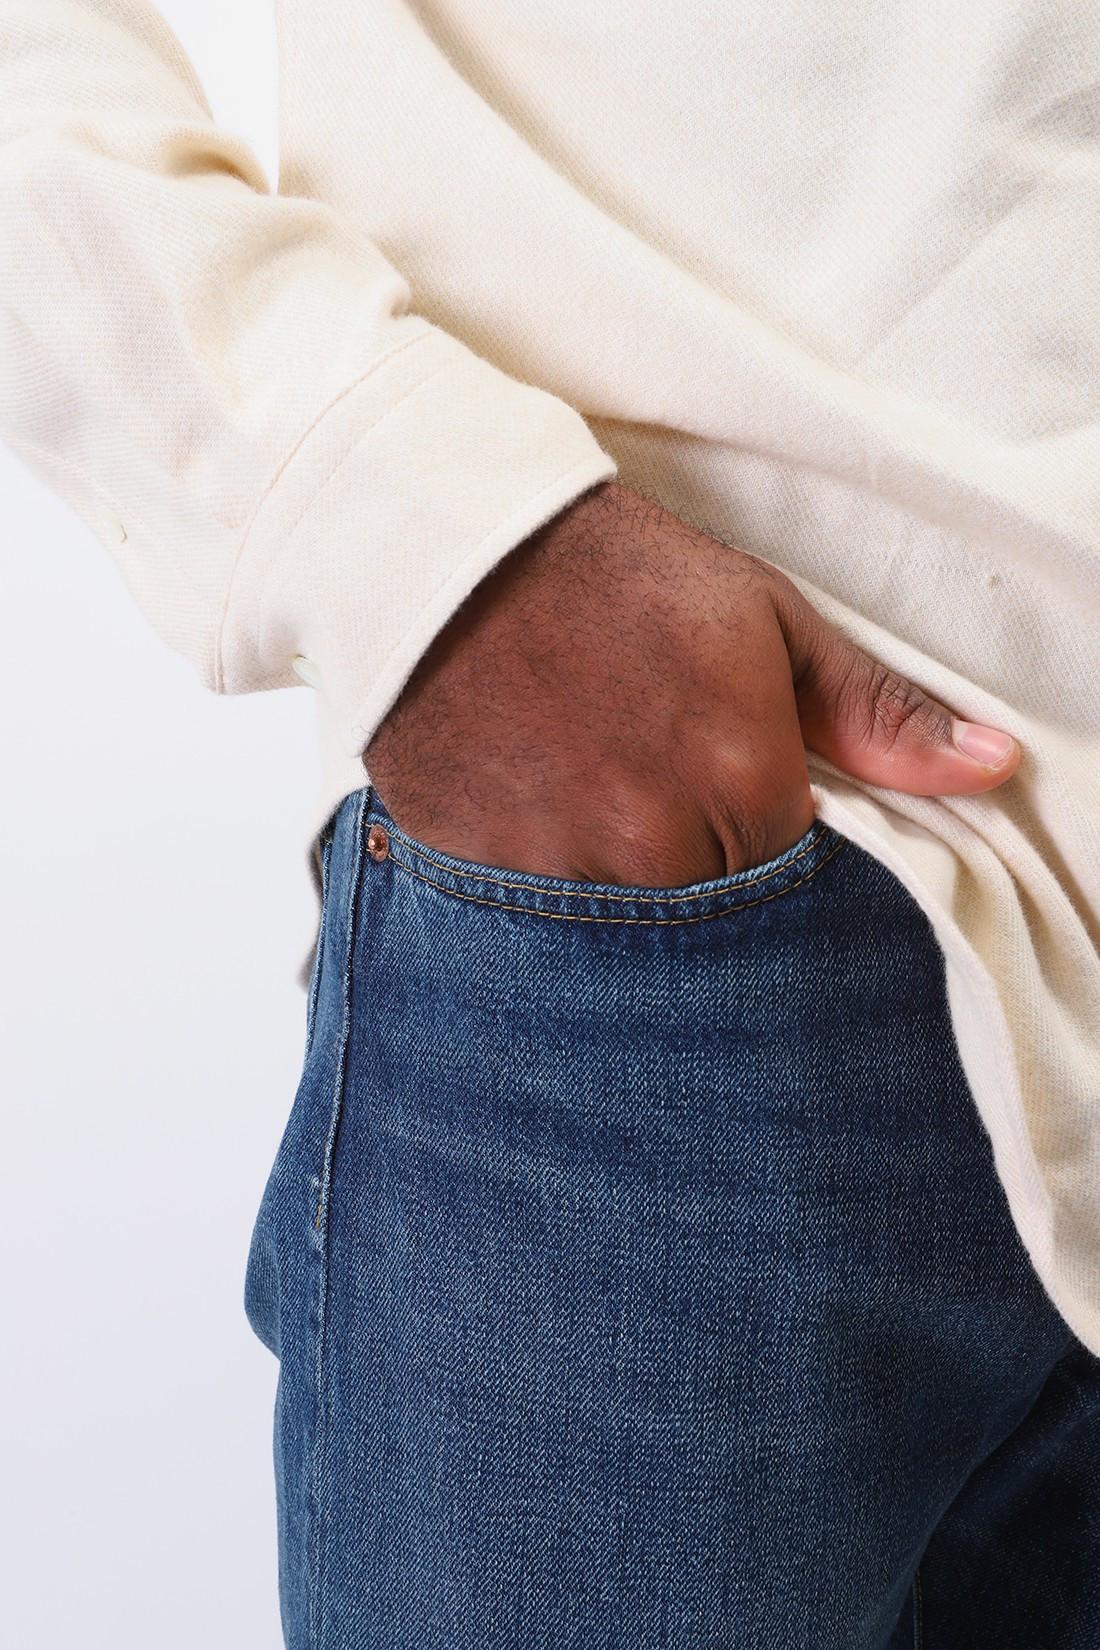 LEVI'S ® VINTAGE CLOTHING / 1954 501 jeans Still breath